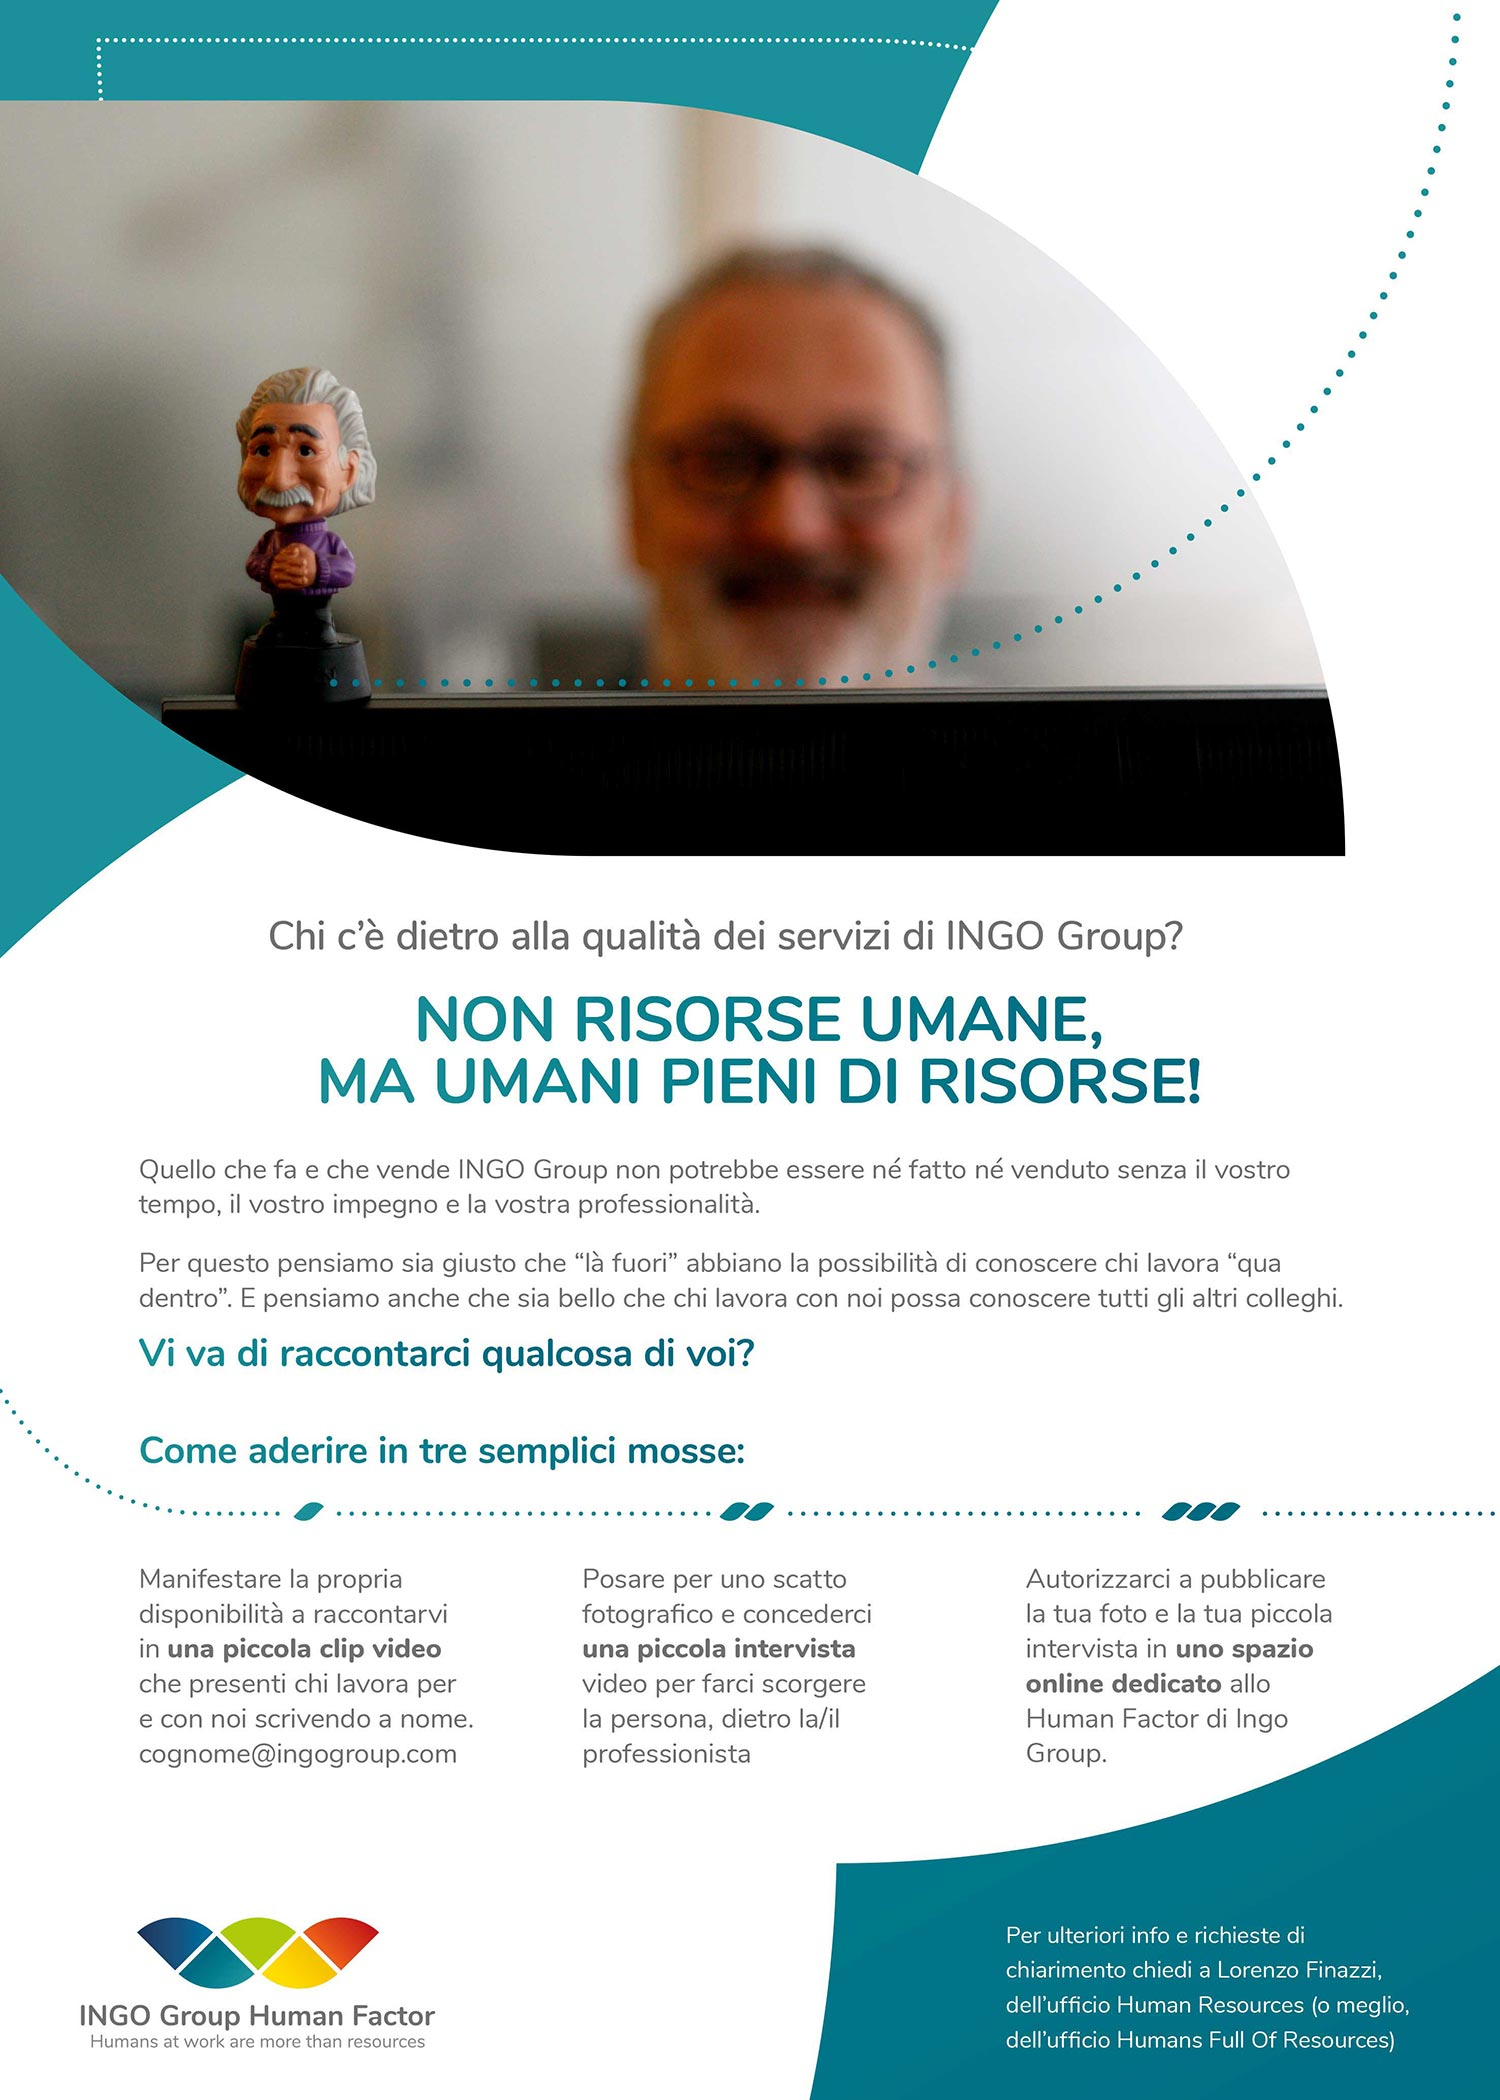 INGO_Campagna-adesioni_intoowit